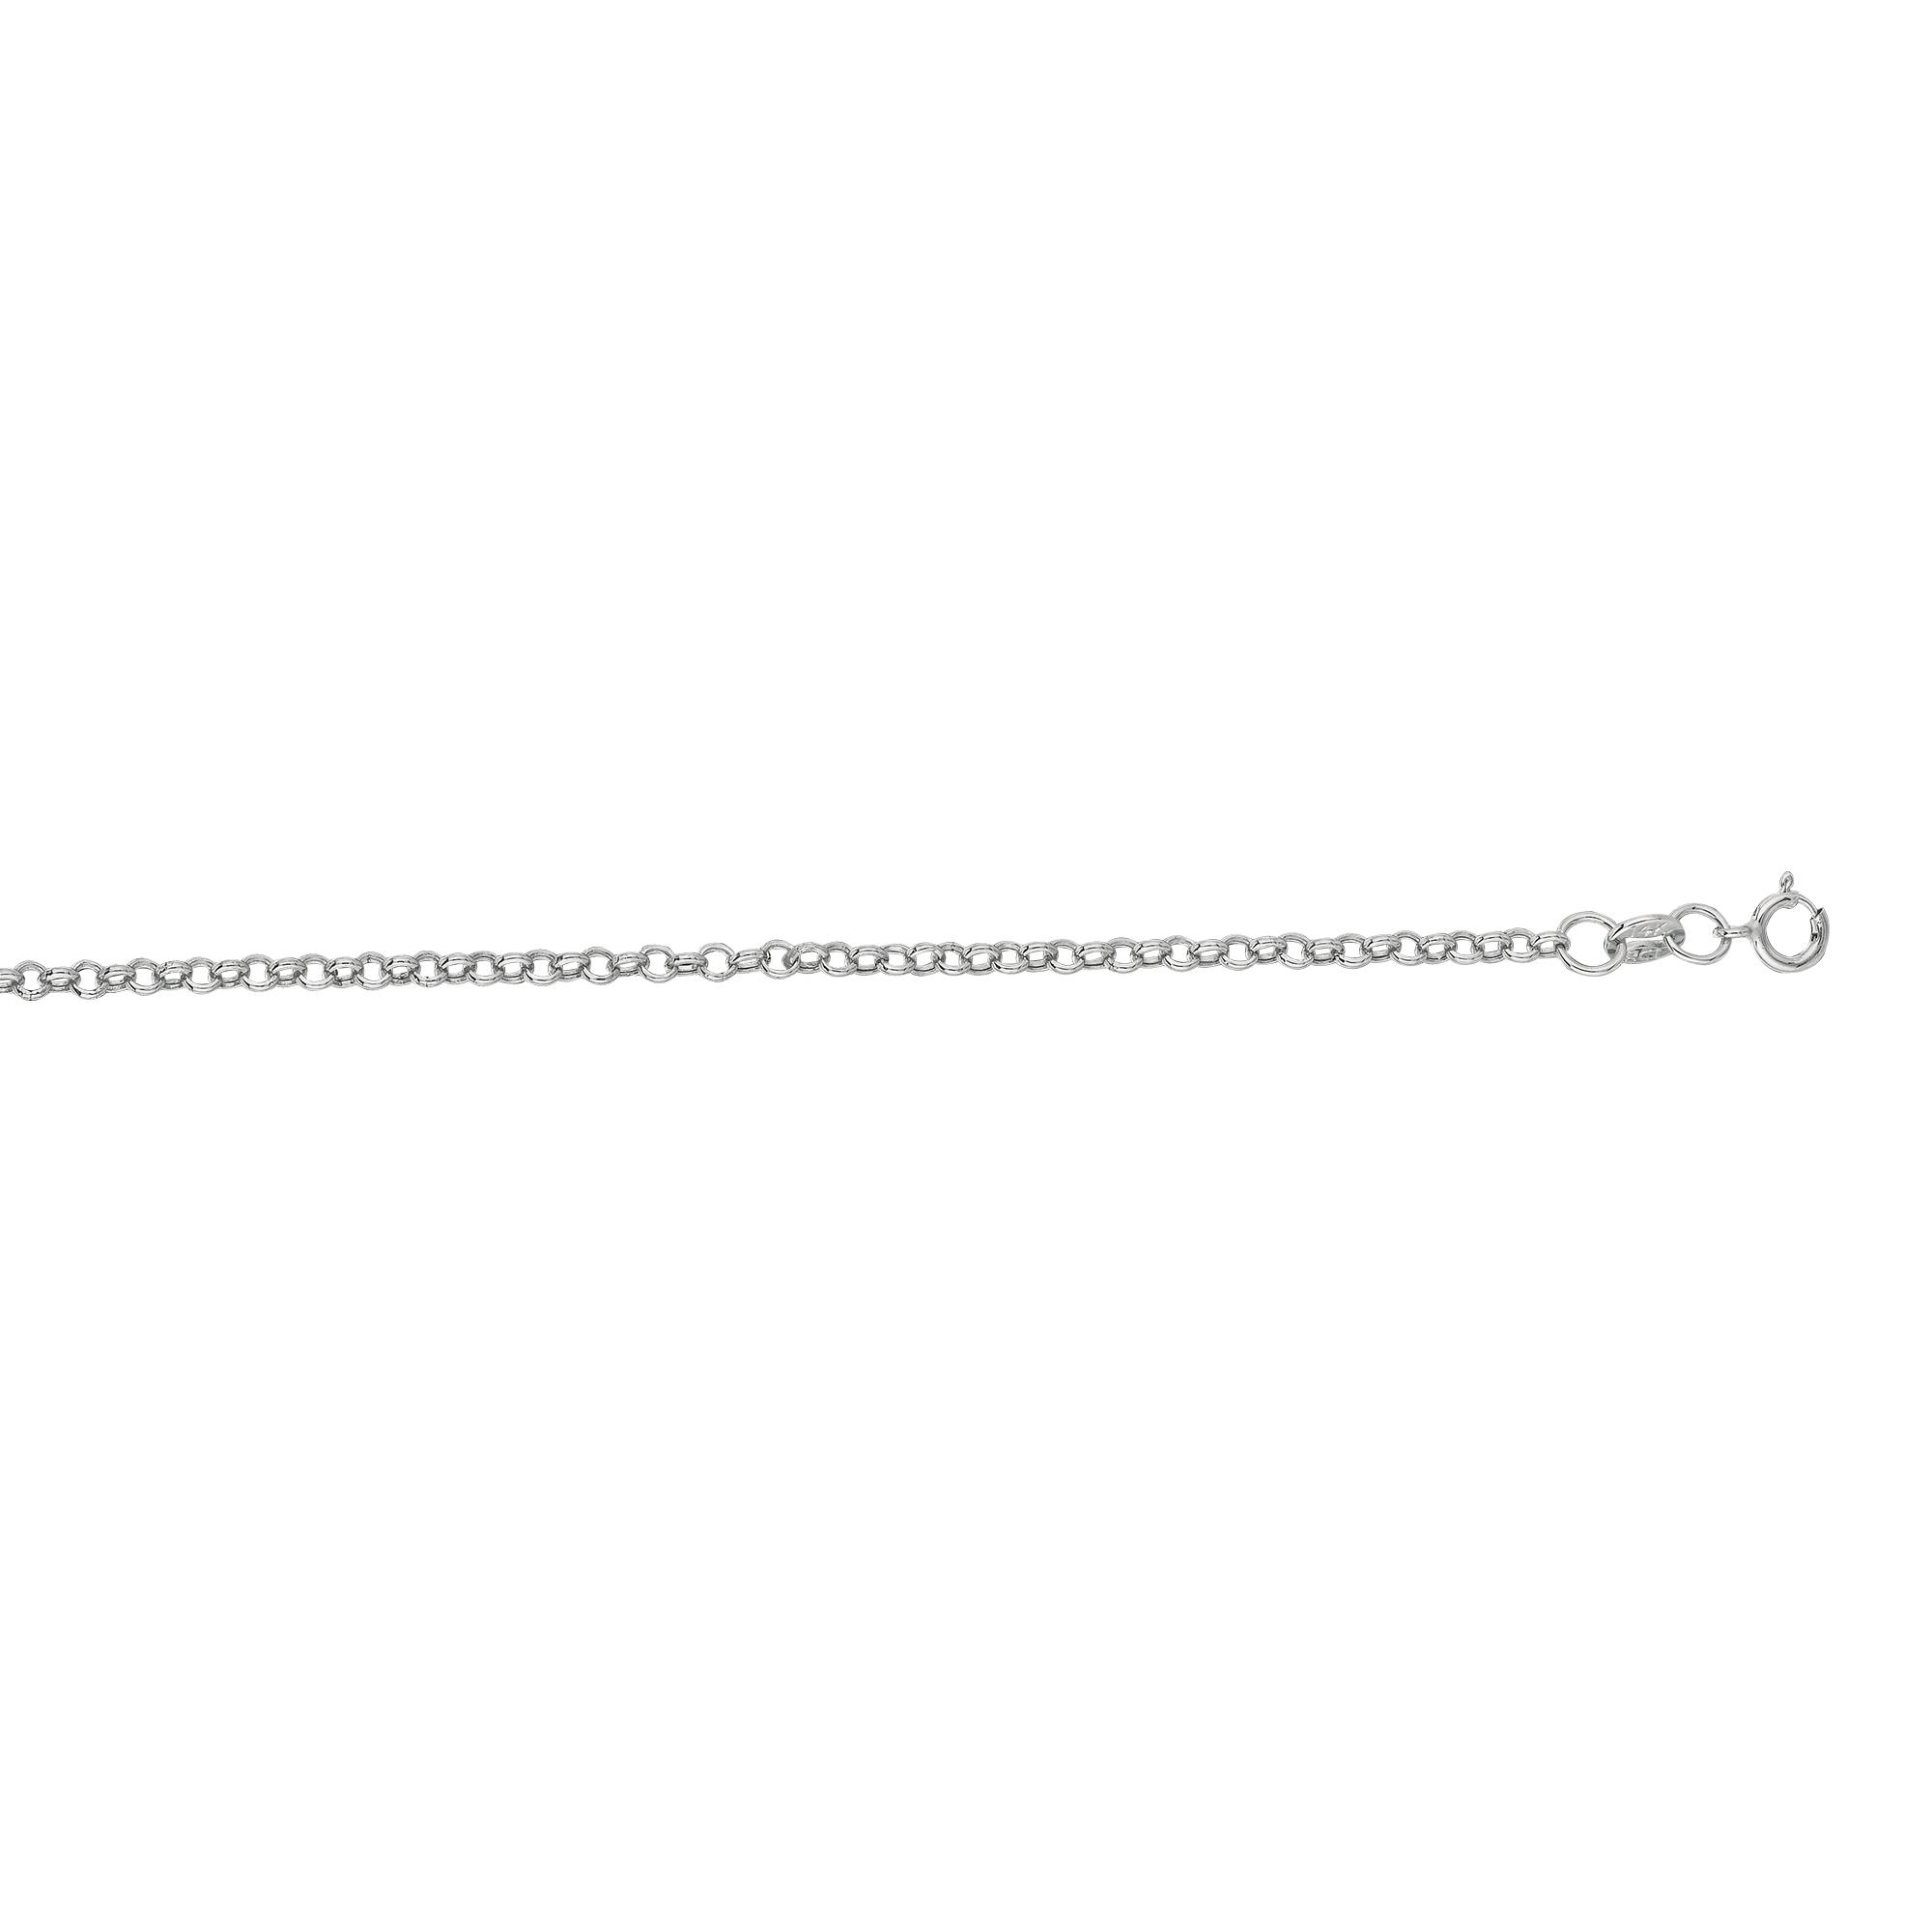 Hollow 14k Gold Rolo Chain For Men & Women 2mm Wide